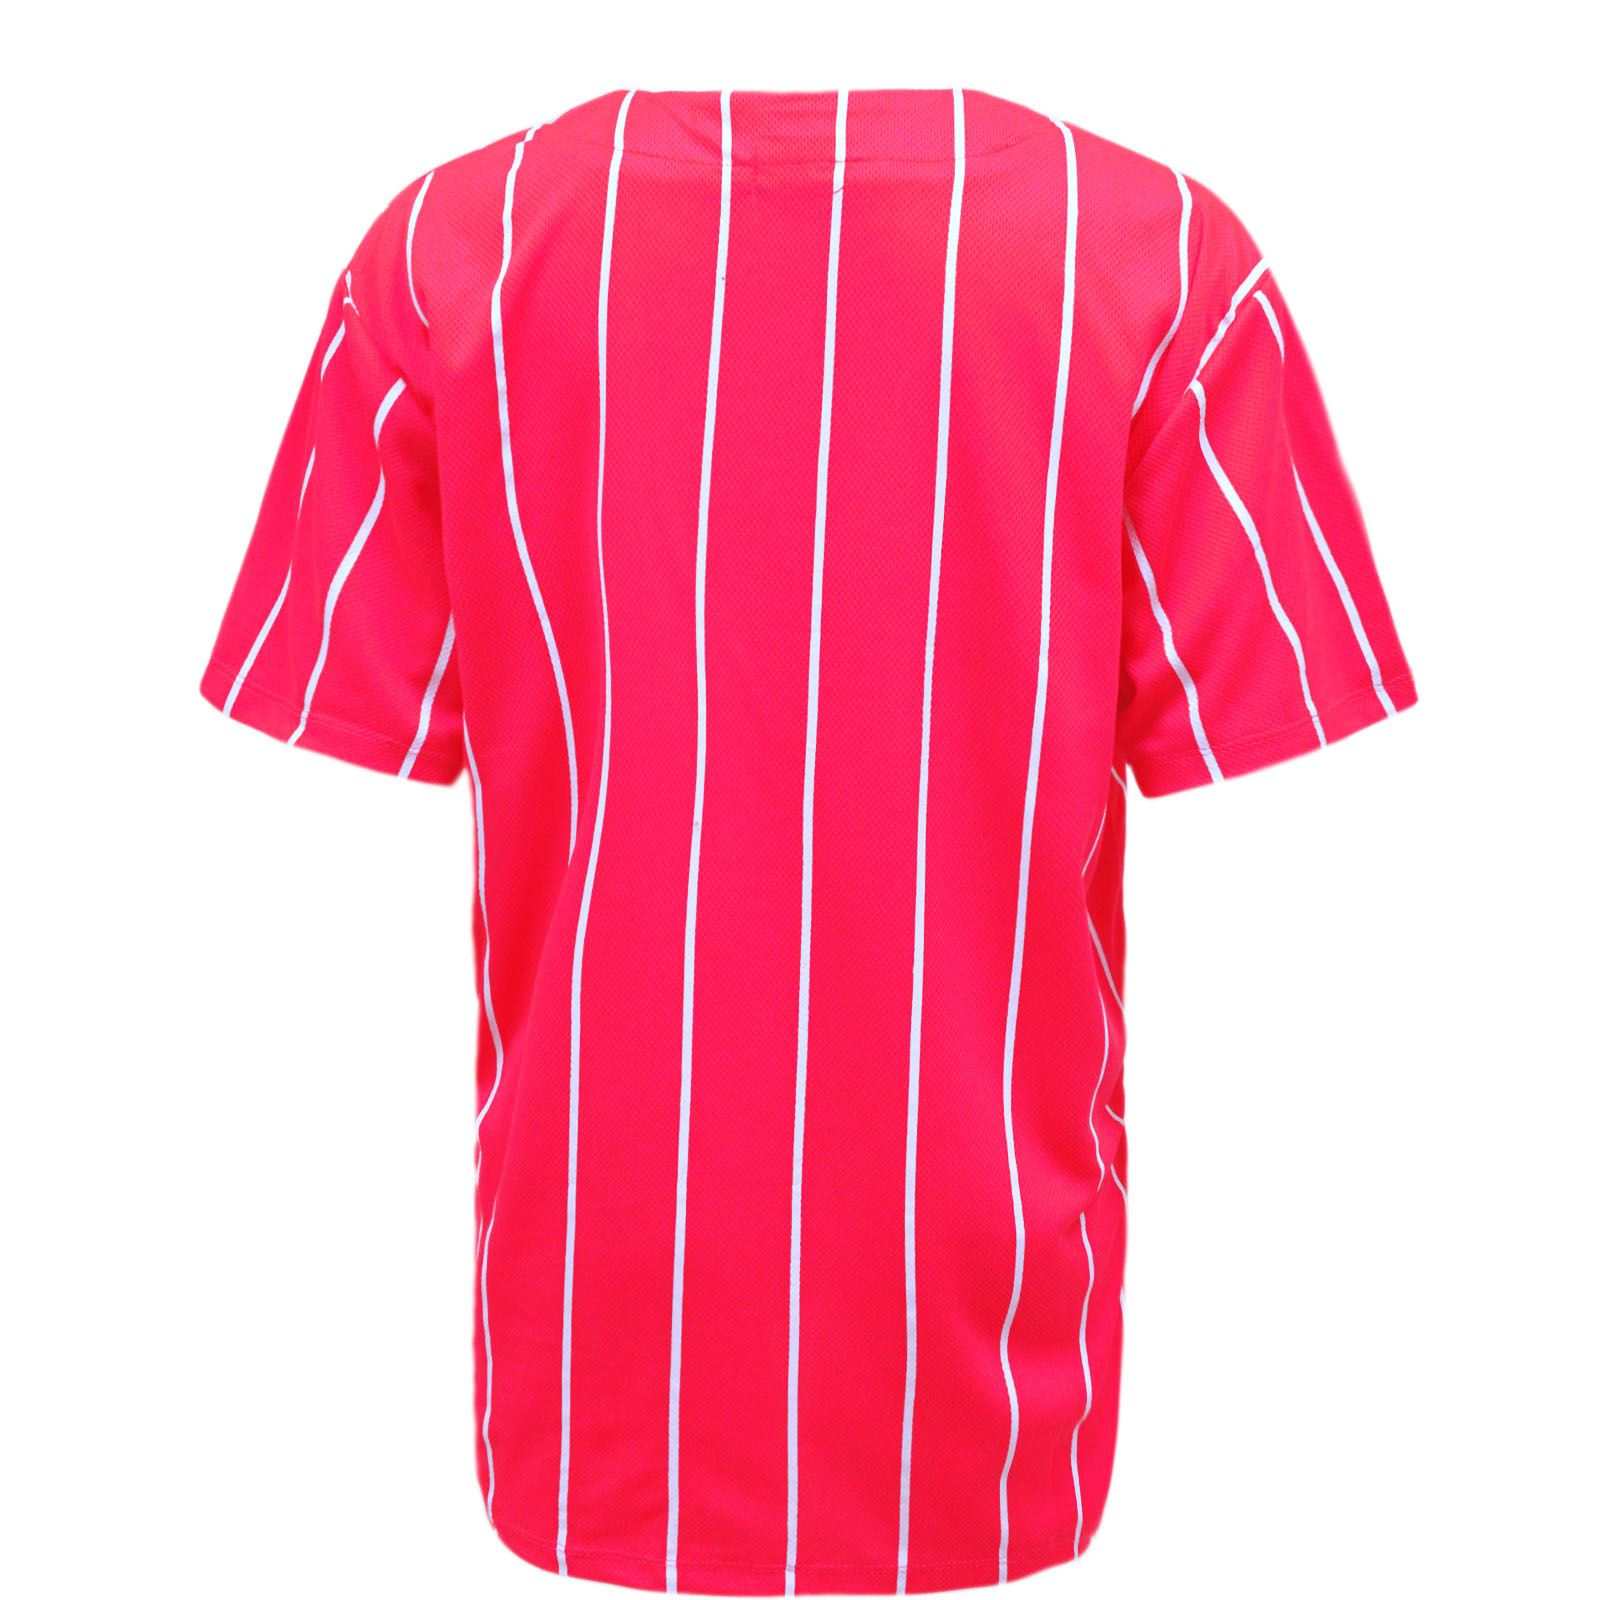 Ac Dc Womens Shirts